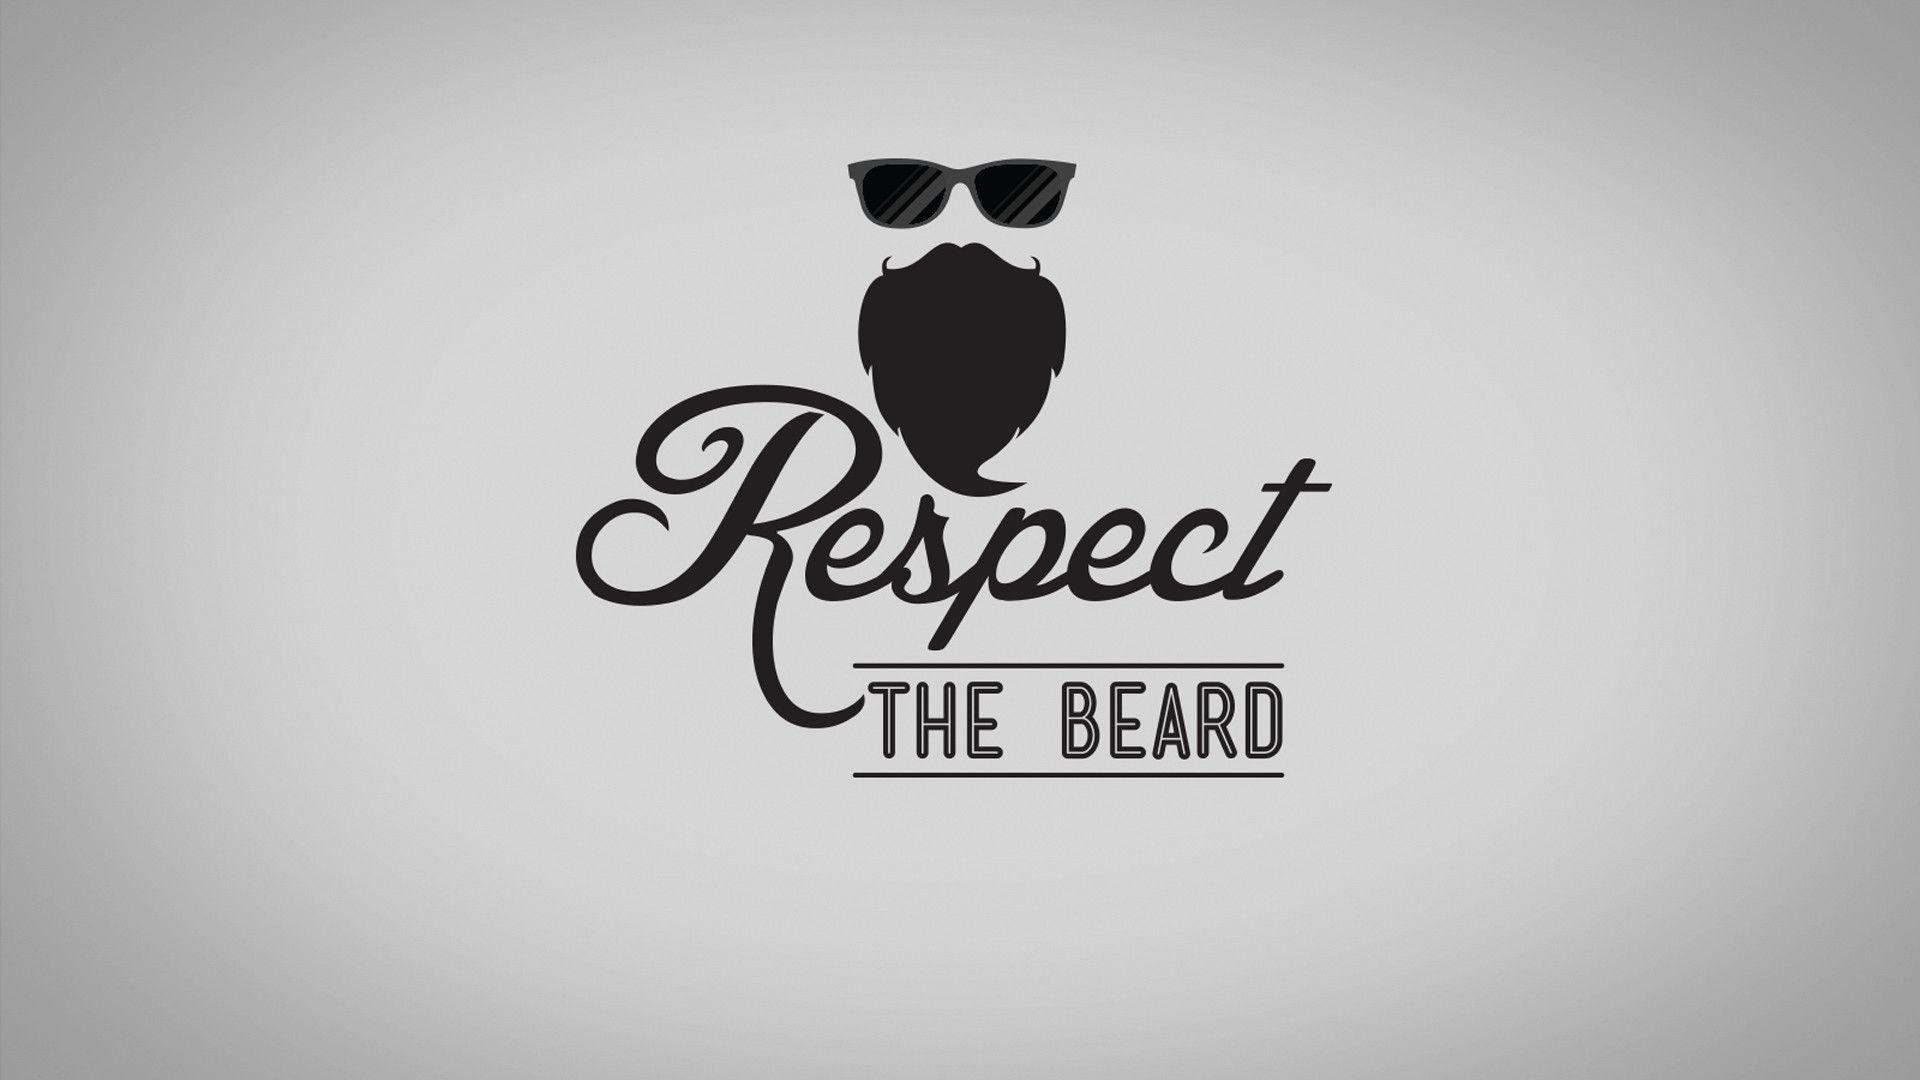 Beard Man Logo Wallpapers - Wallpaper Cave